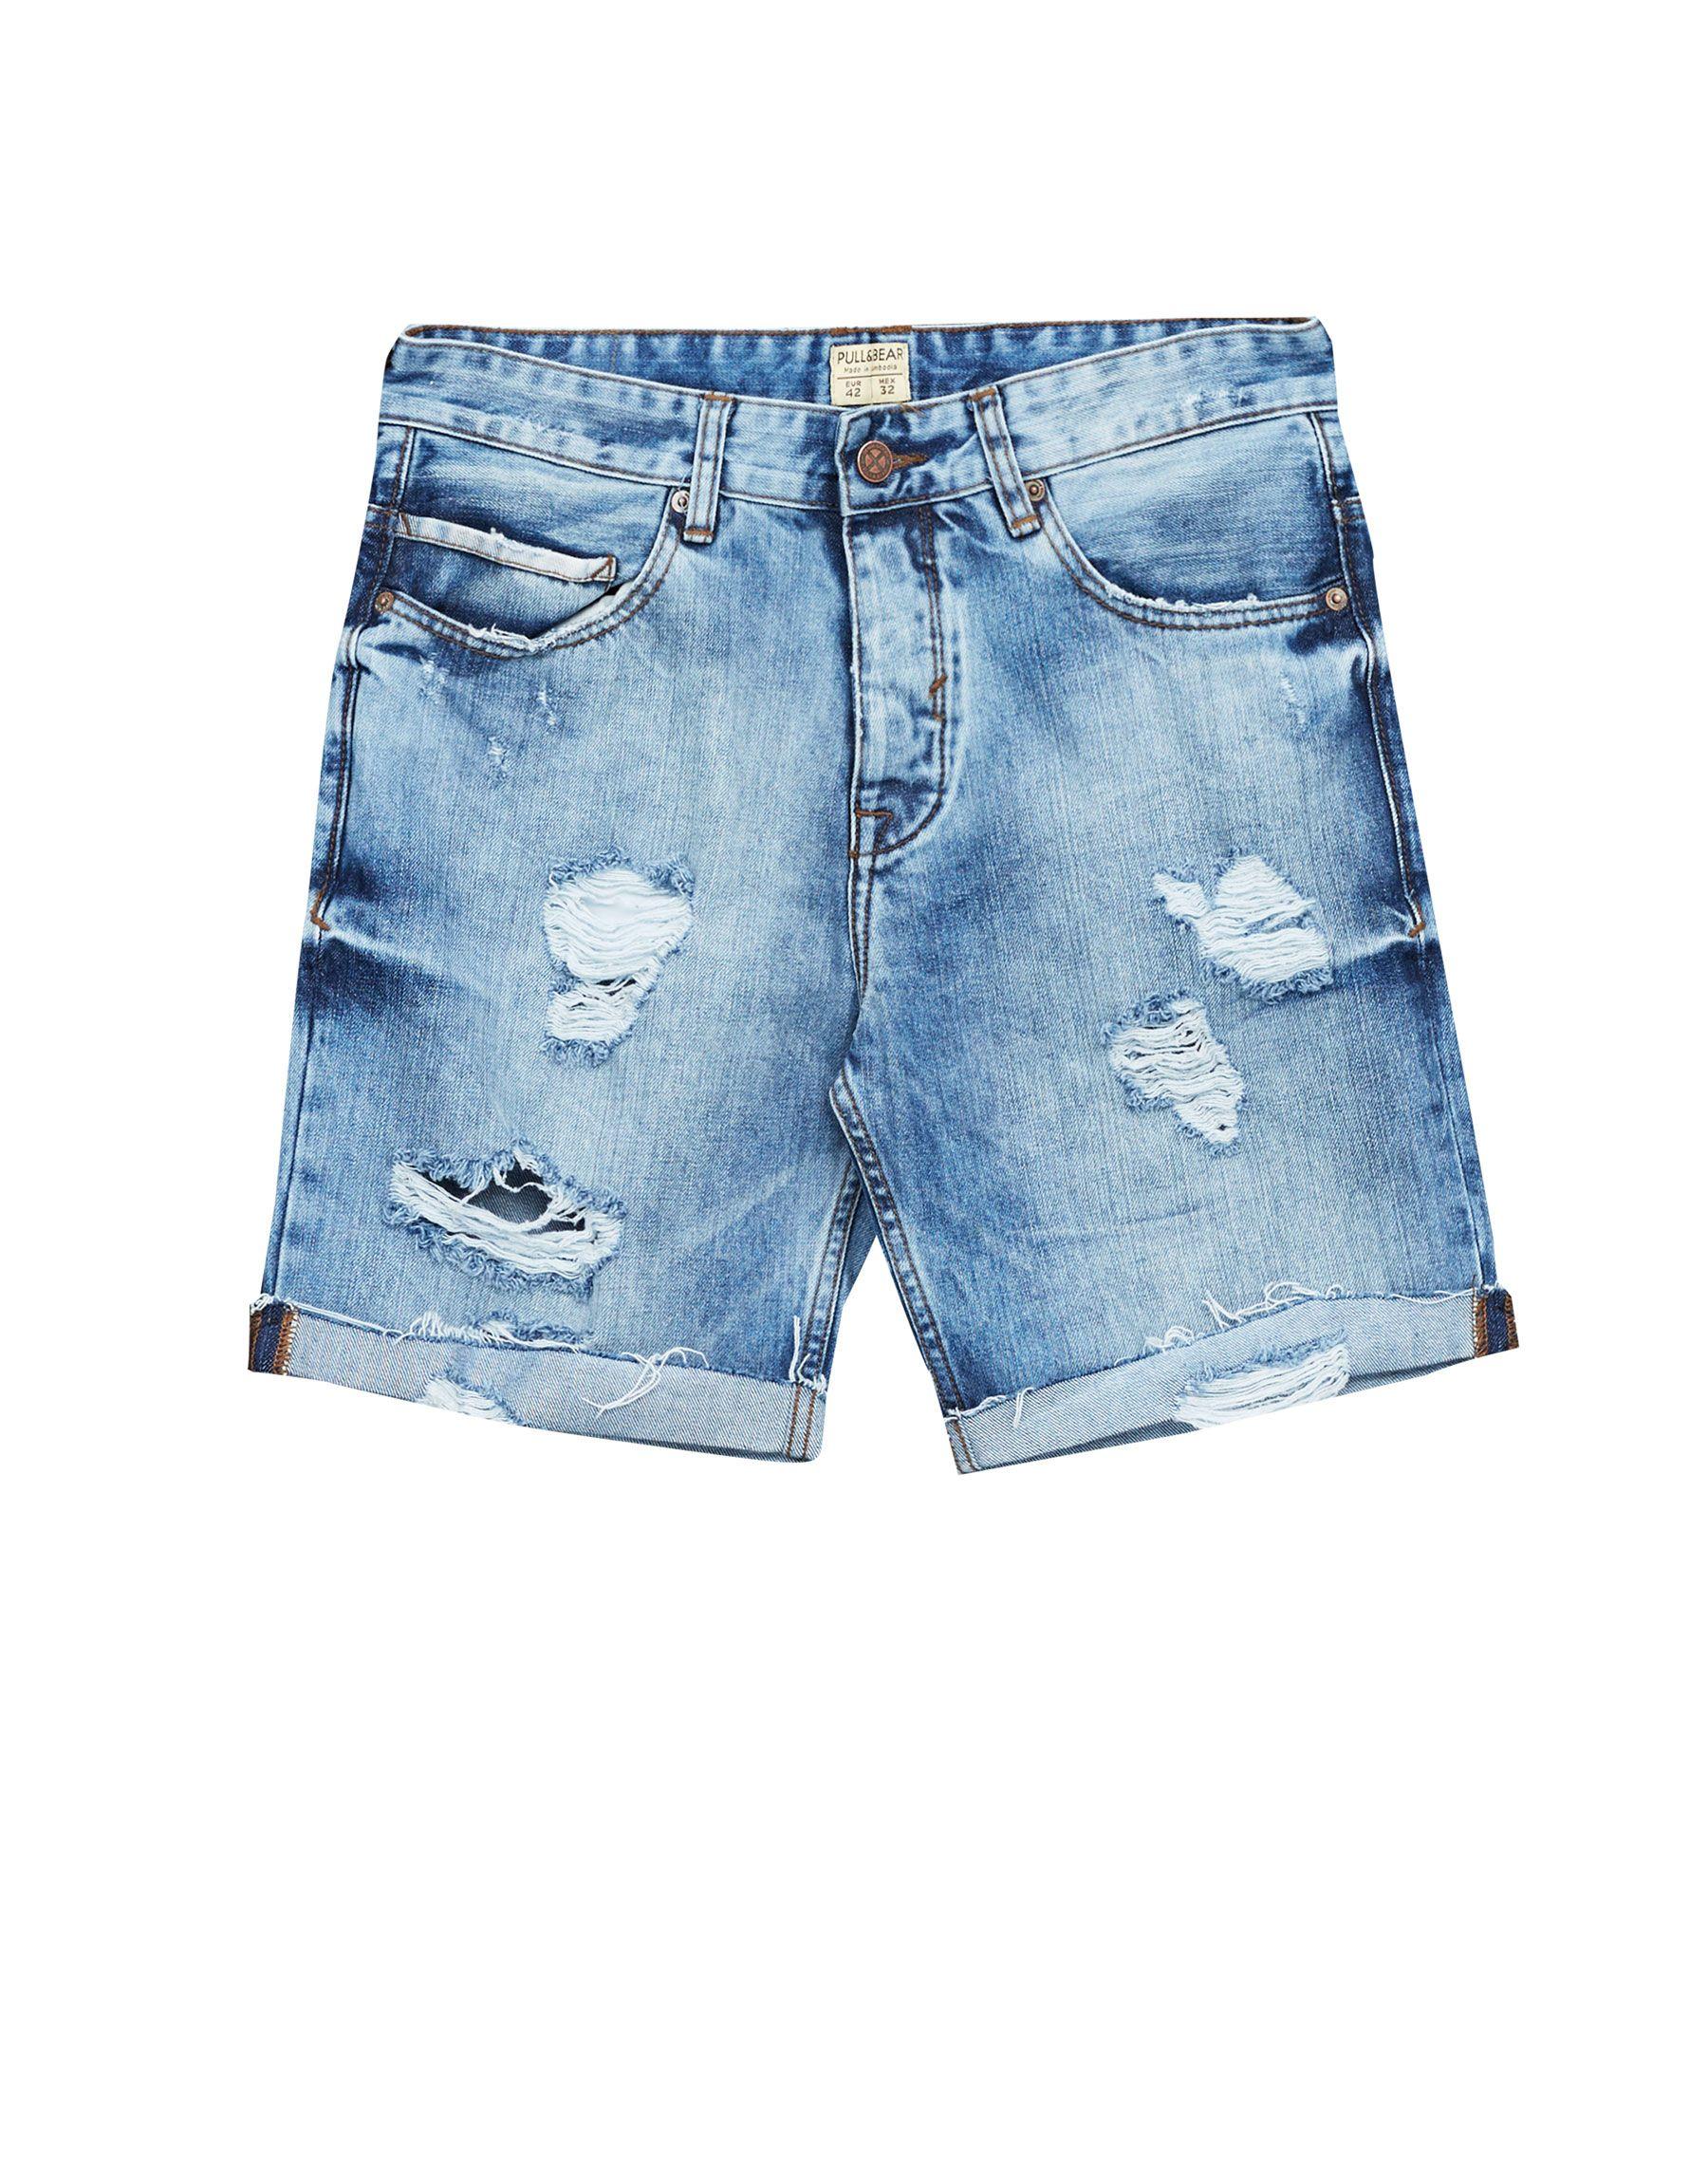 Trendy Uomo Capri Celebration bermuda Cargo shorts Pantaloni Corti Short